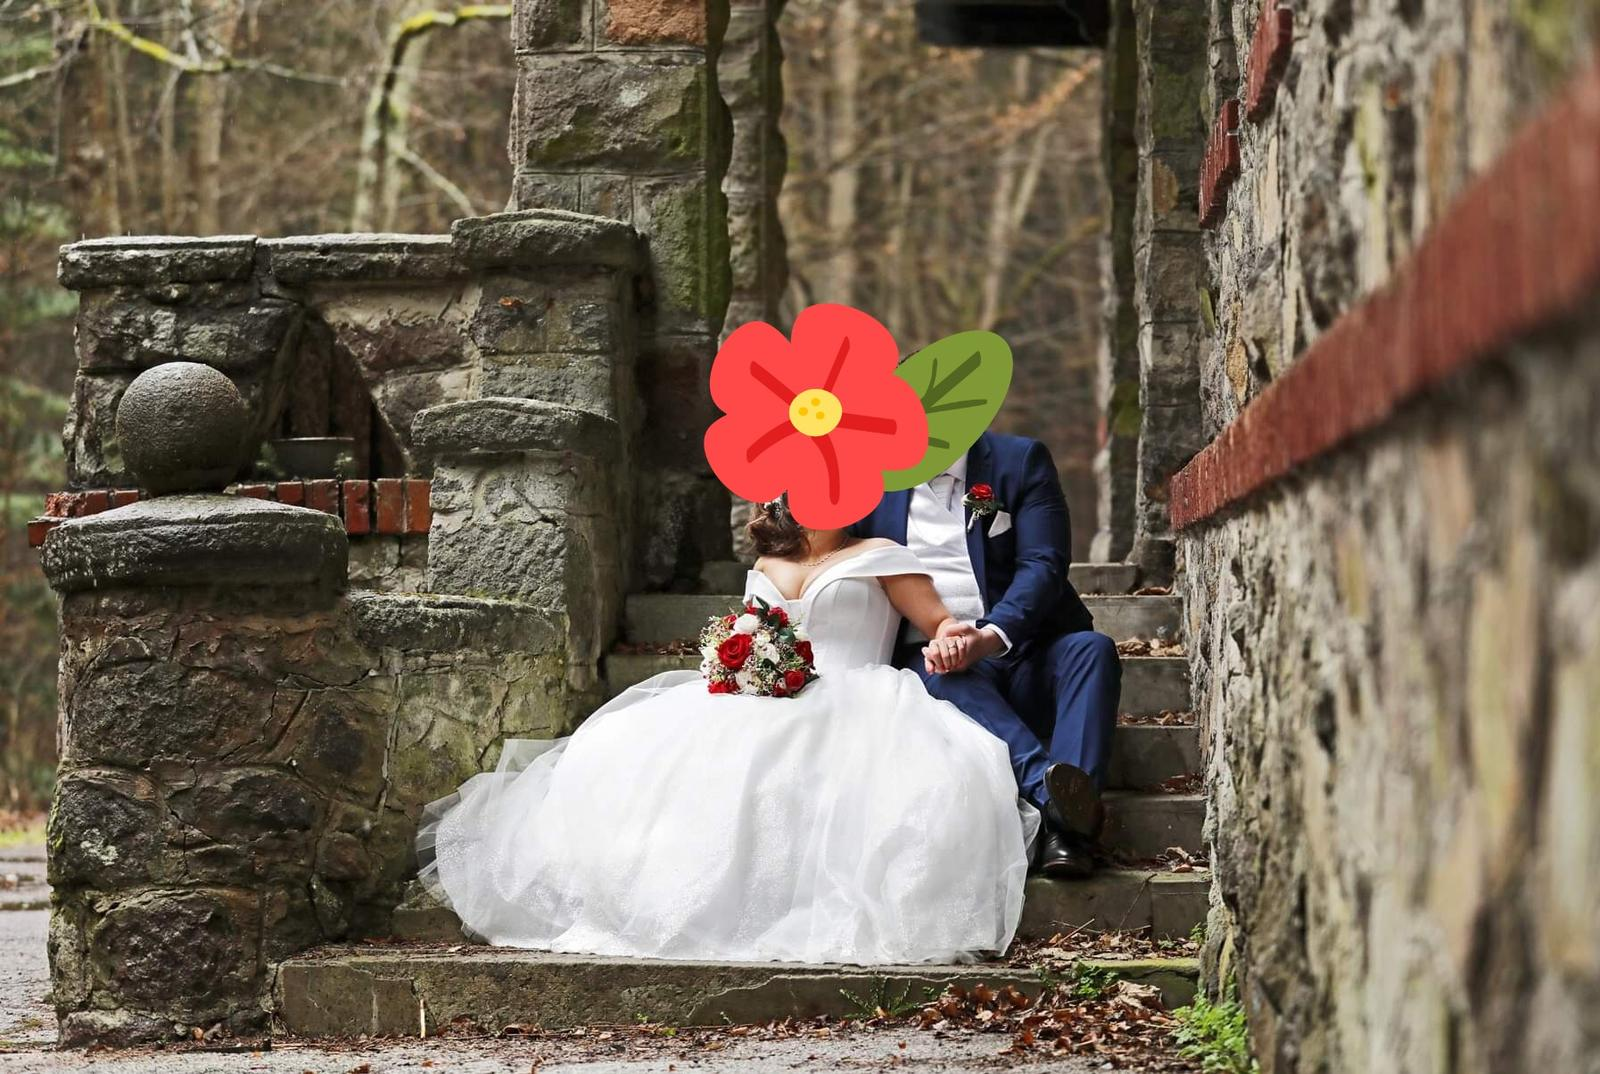 luxusné svadobné šaty - Obrázok č. 3